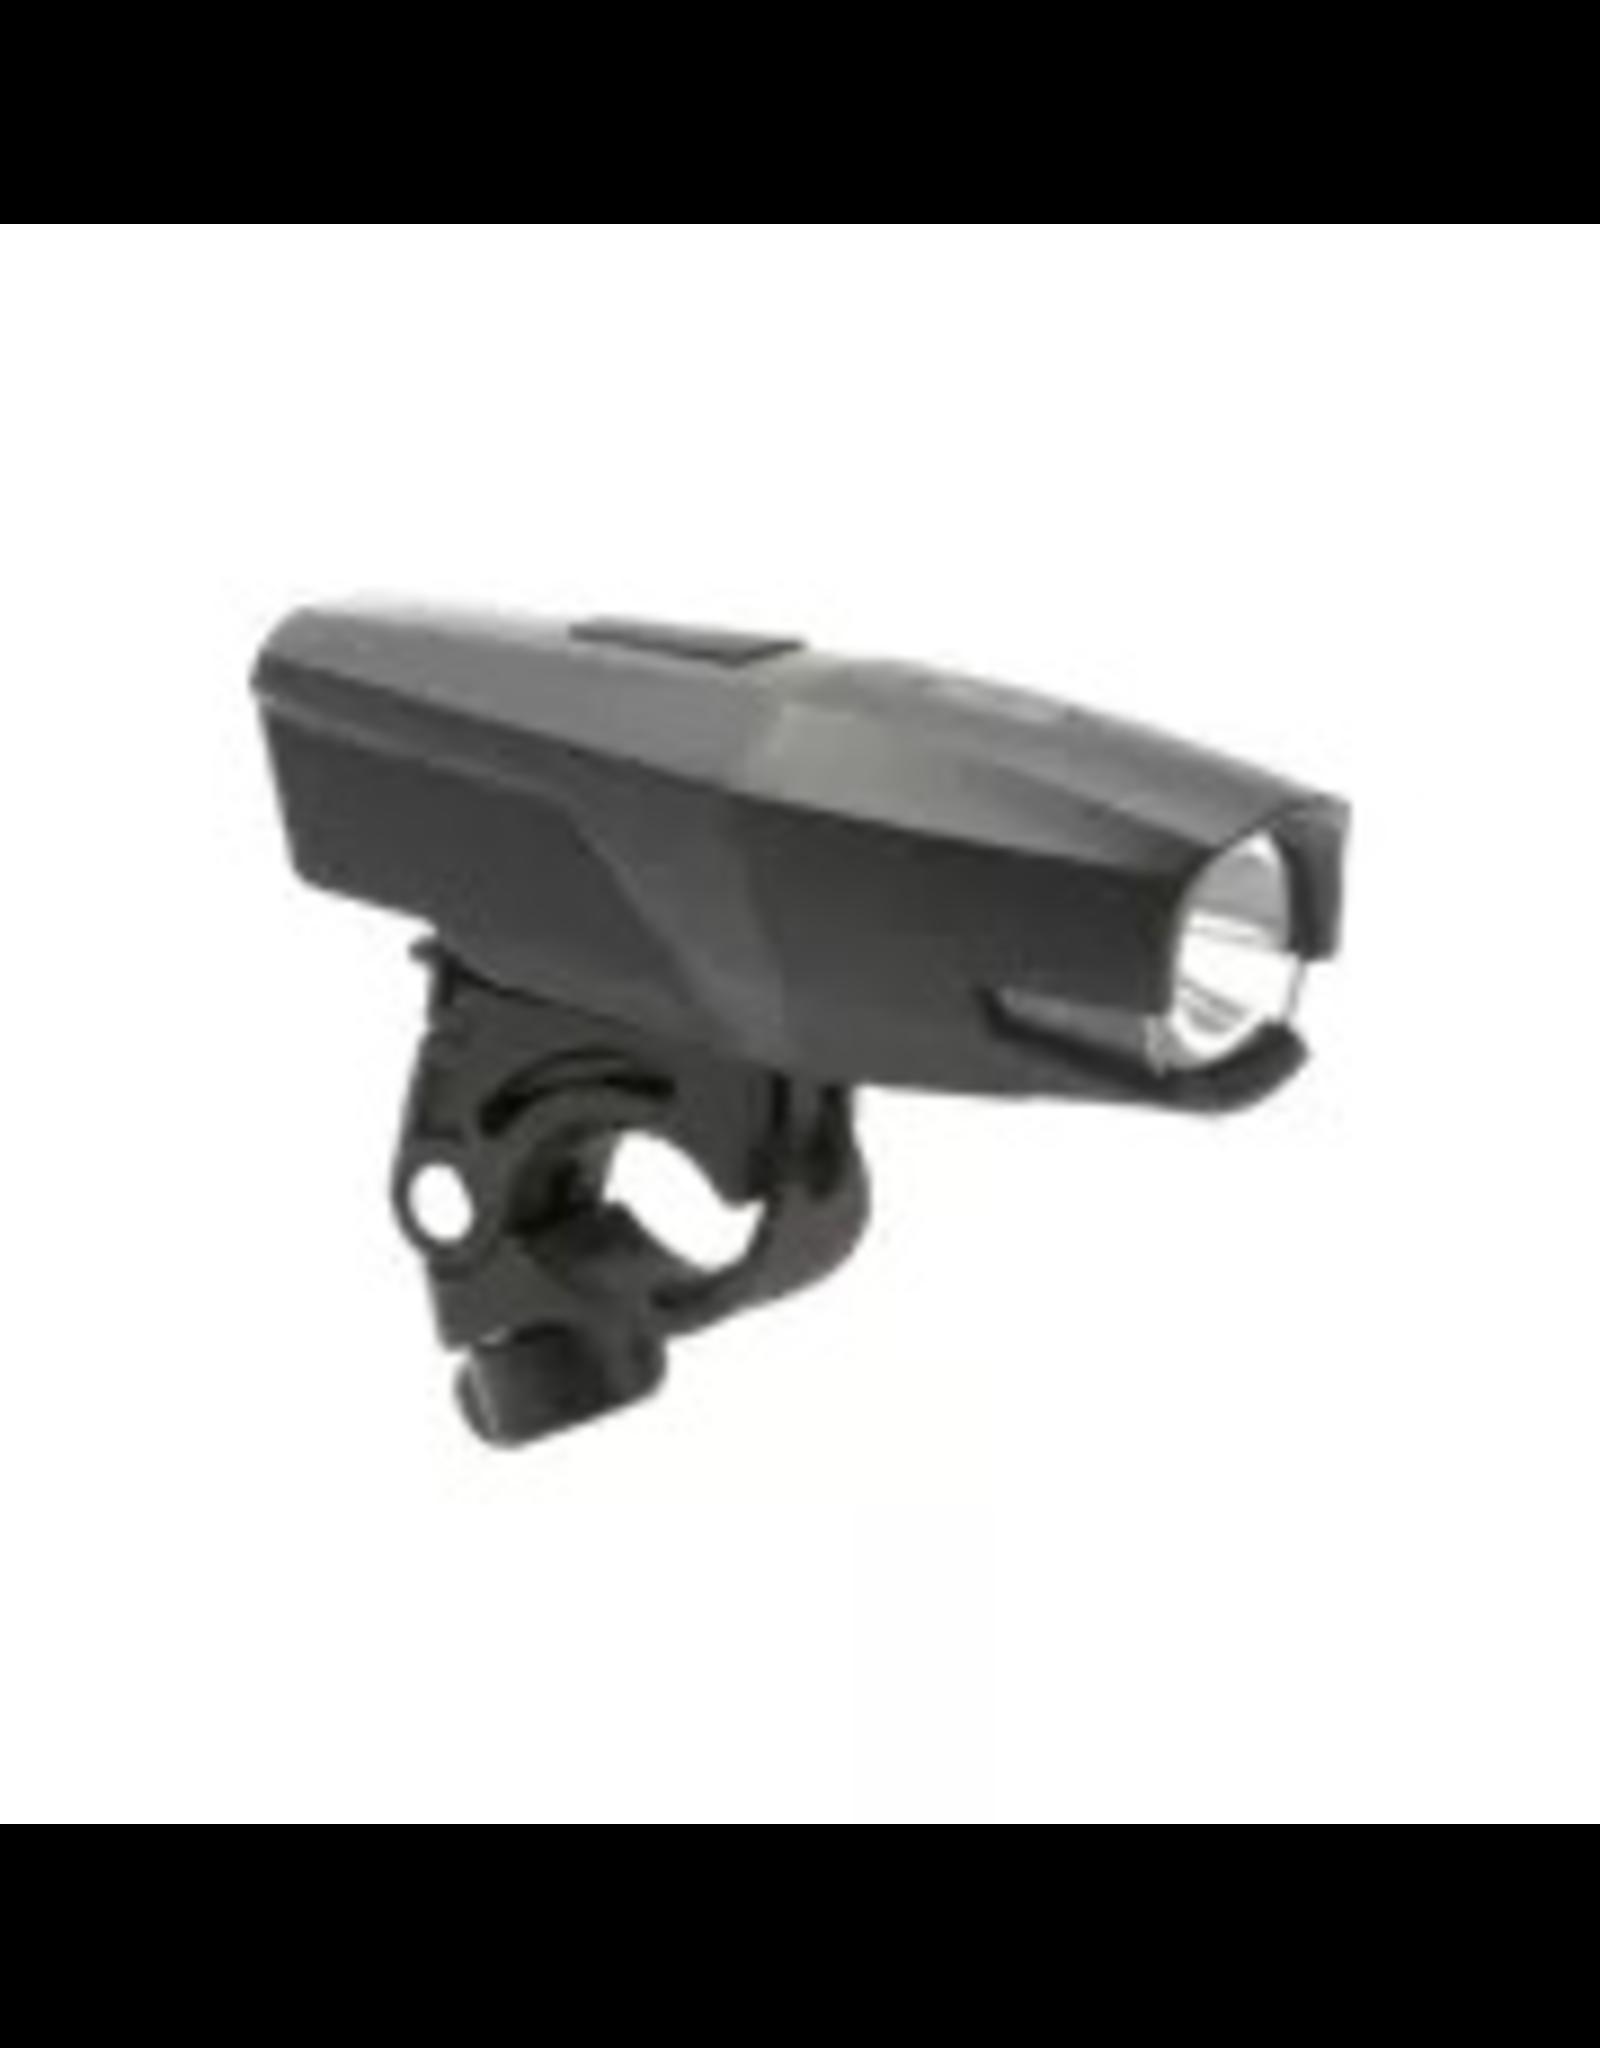 PDW City Rover Headlight 700lm Bk